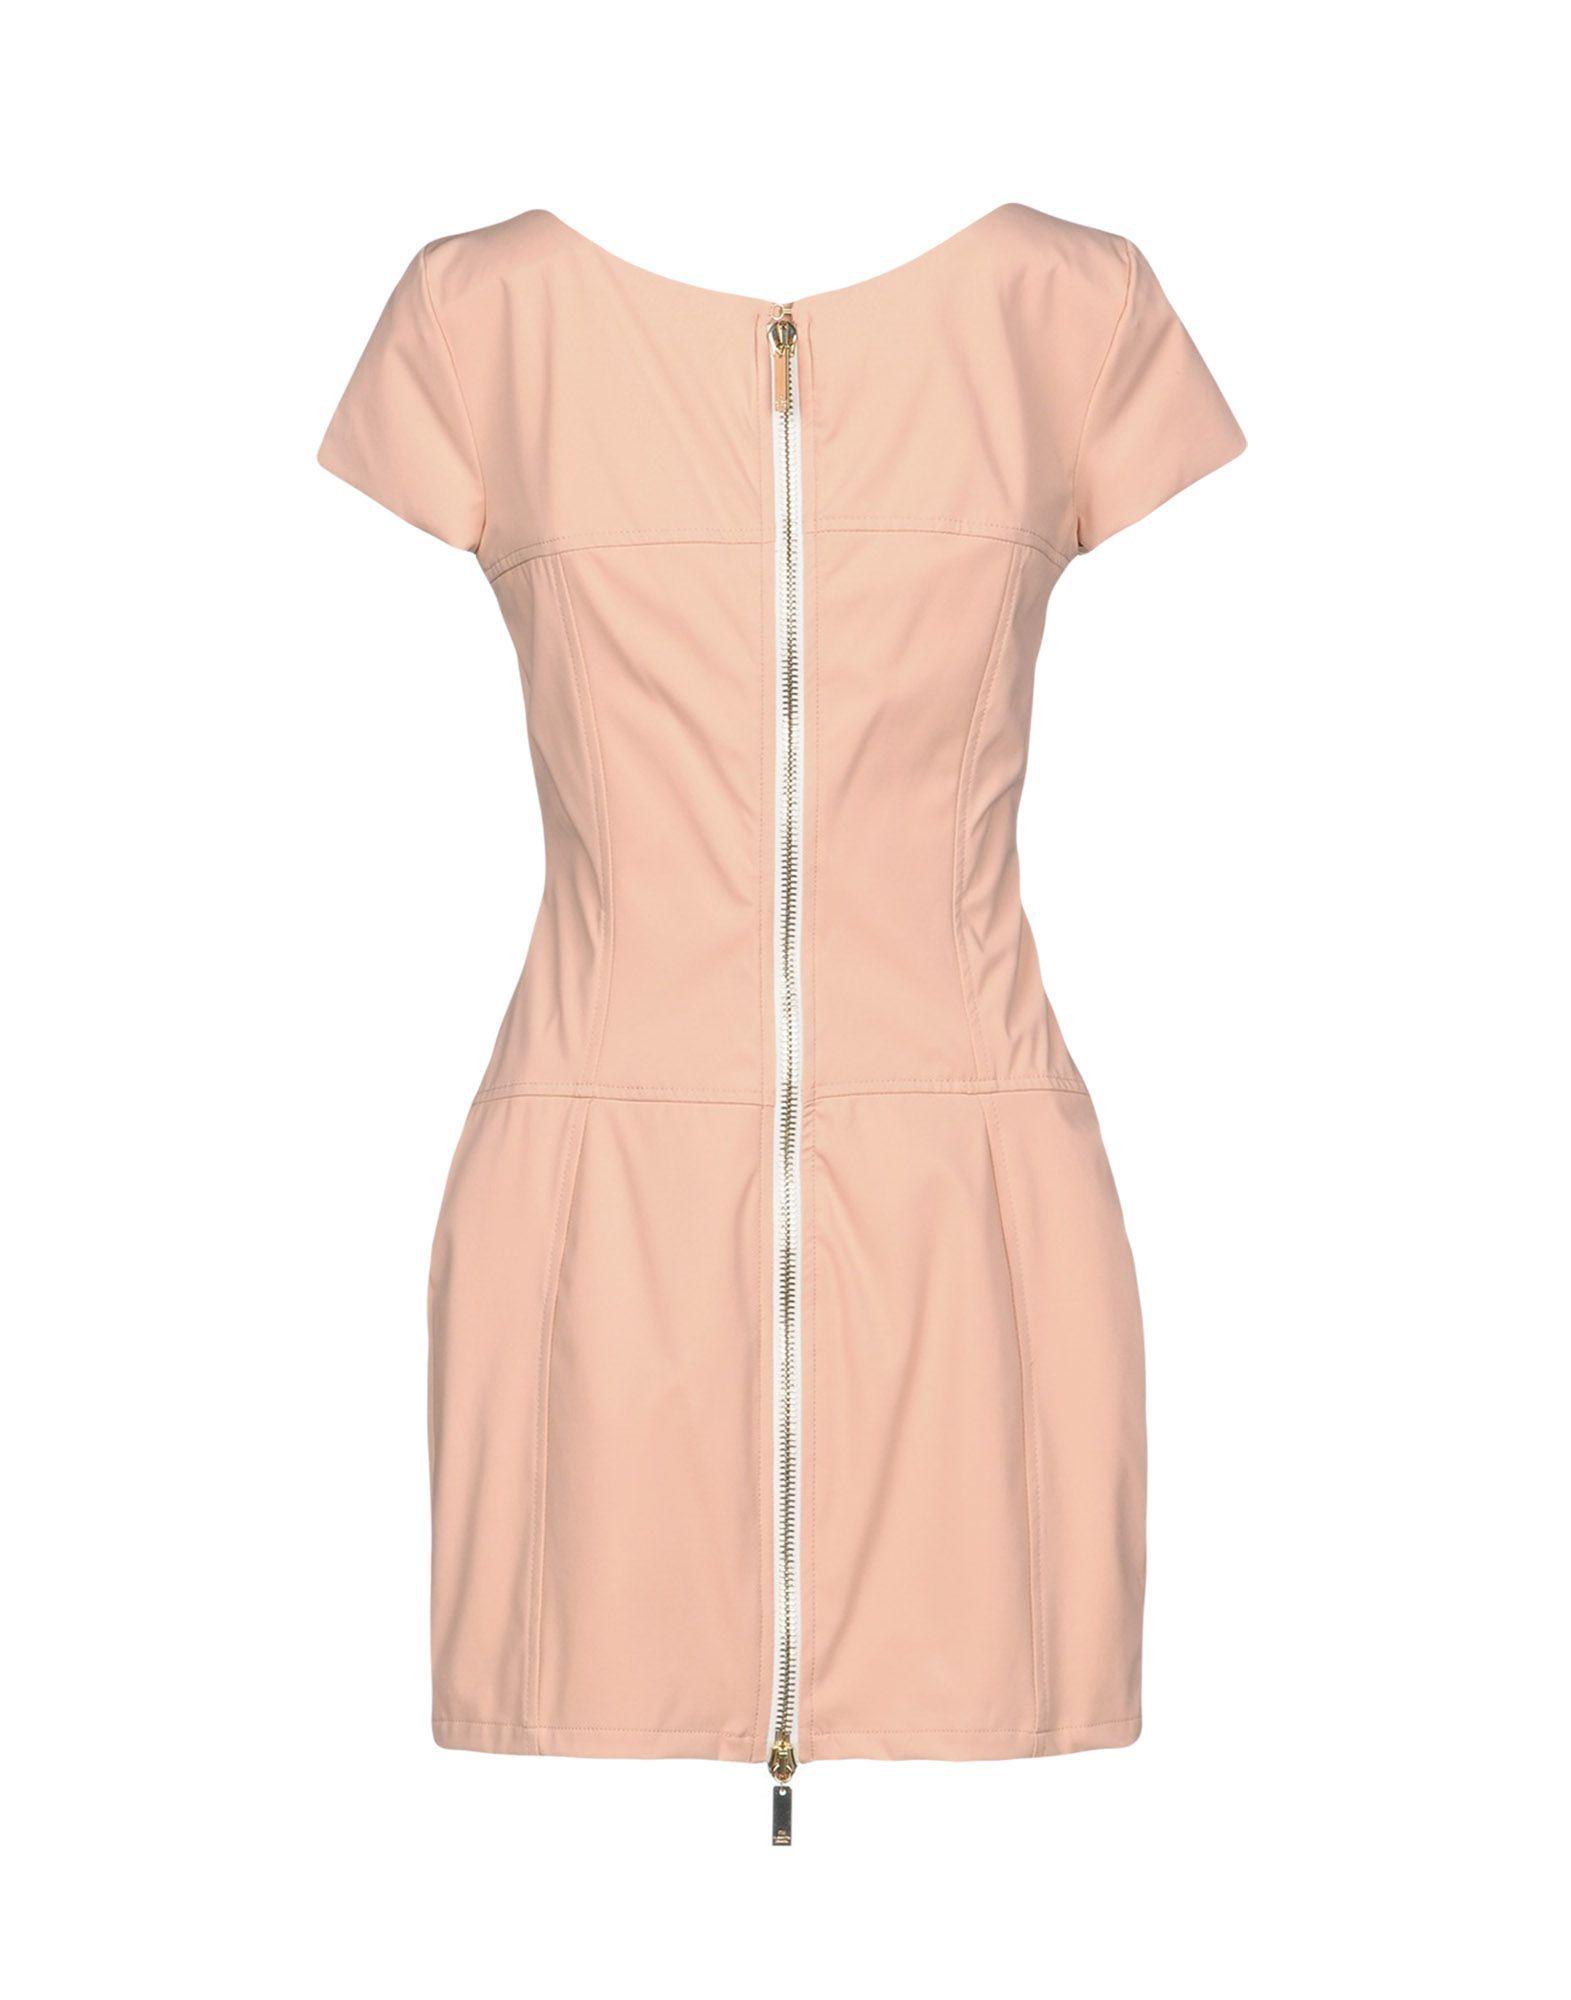 Elisabetta Franchi Pink Short Sleeve Short Dress